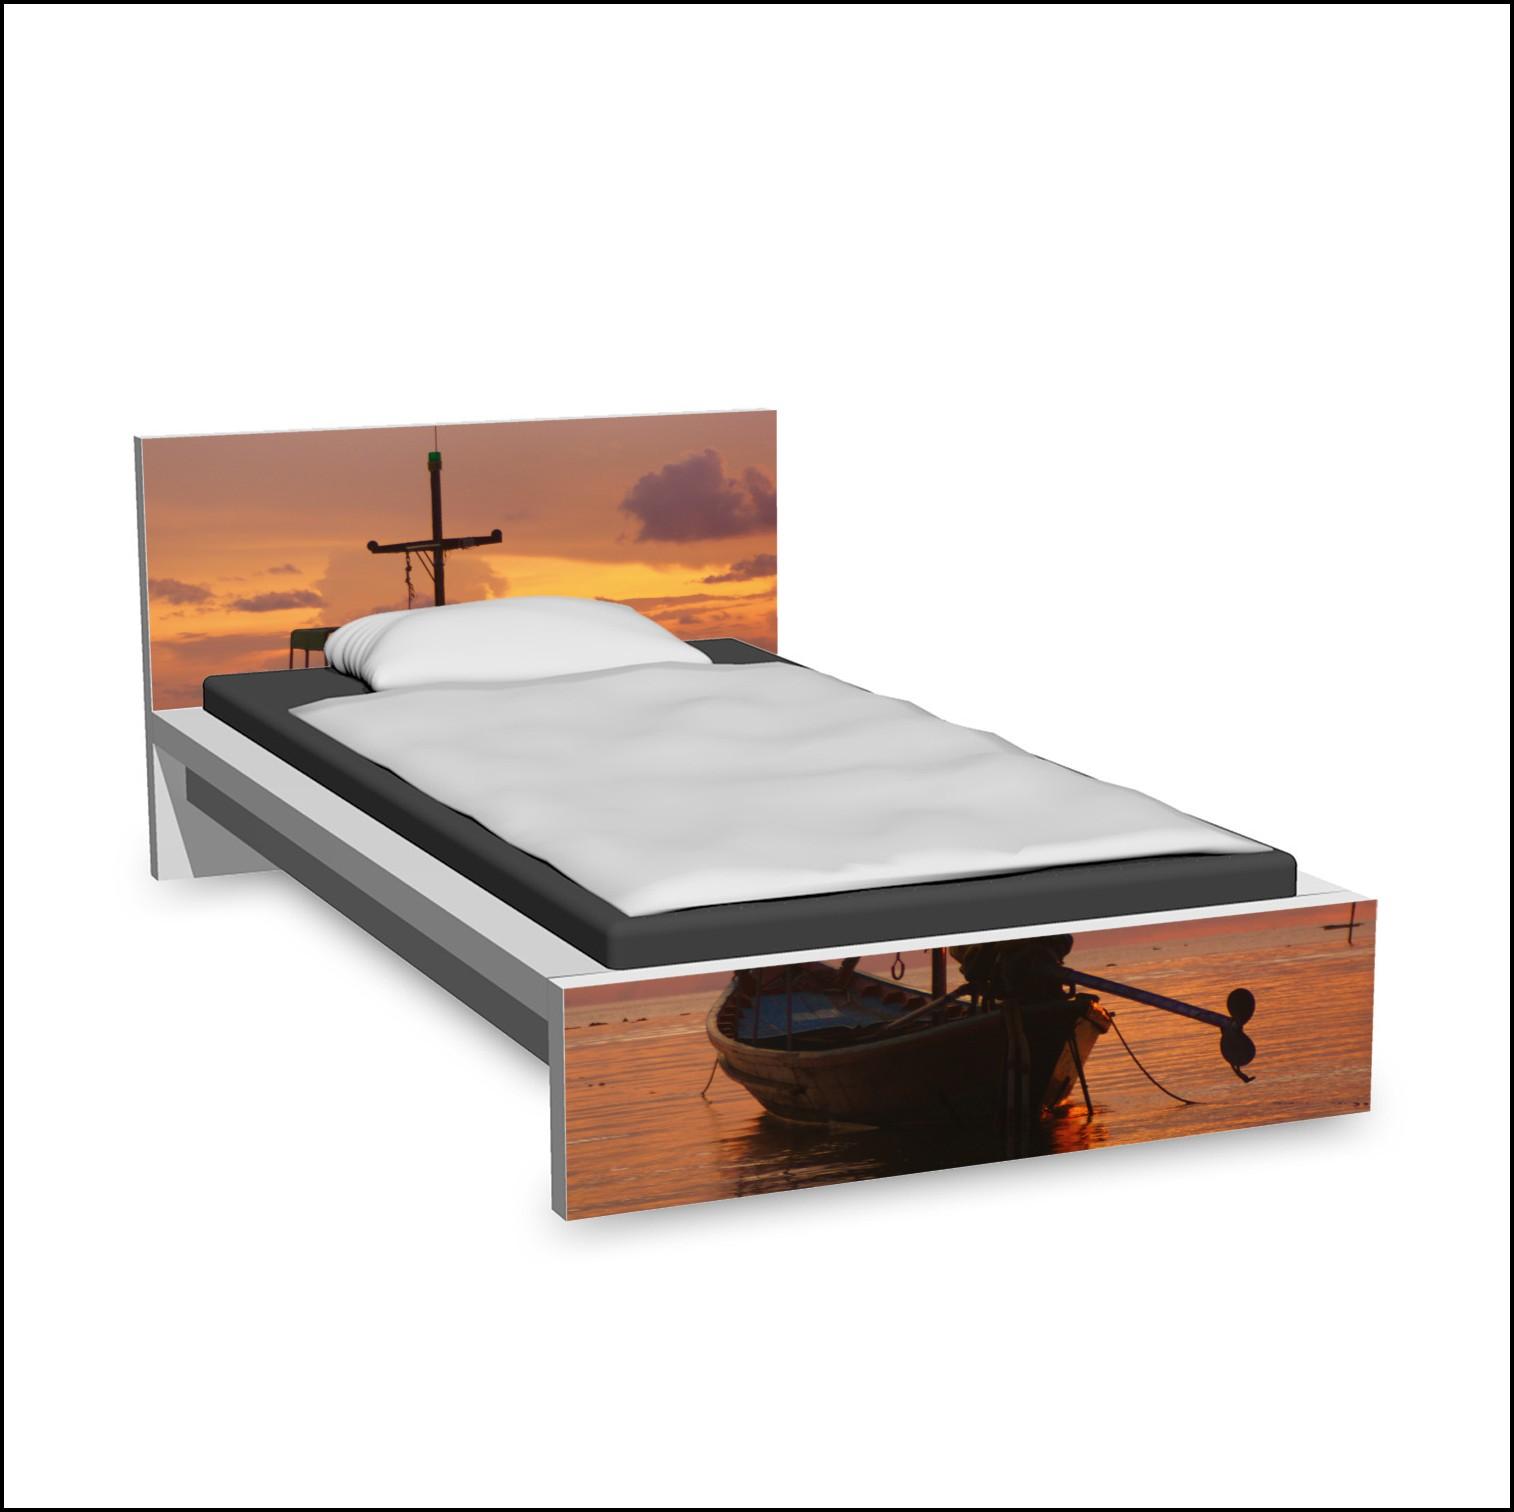 Ikea Malm Tisch über Bett